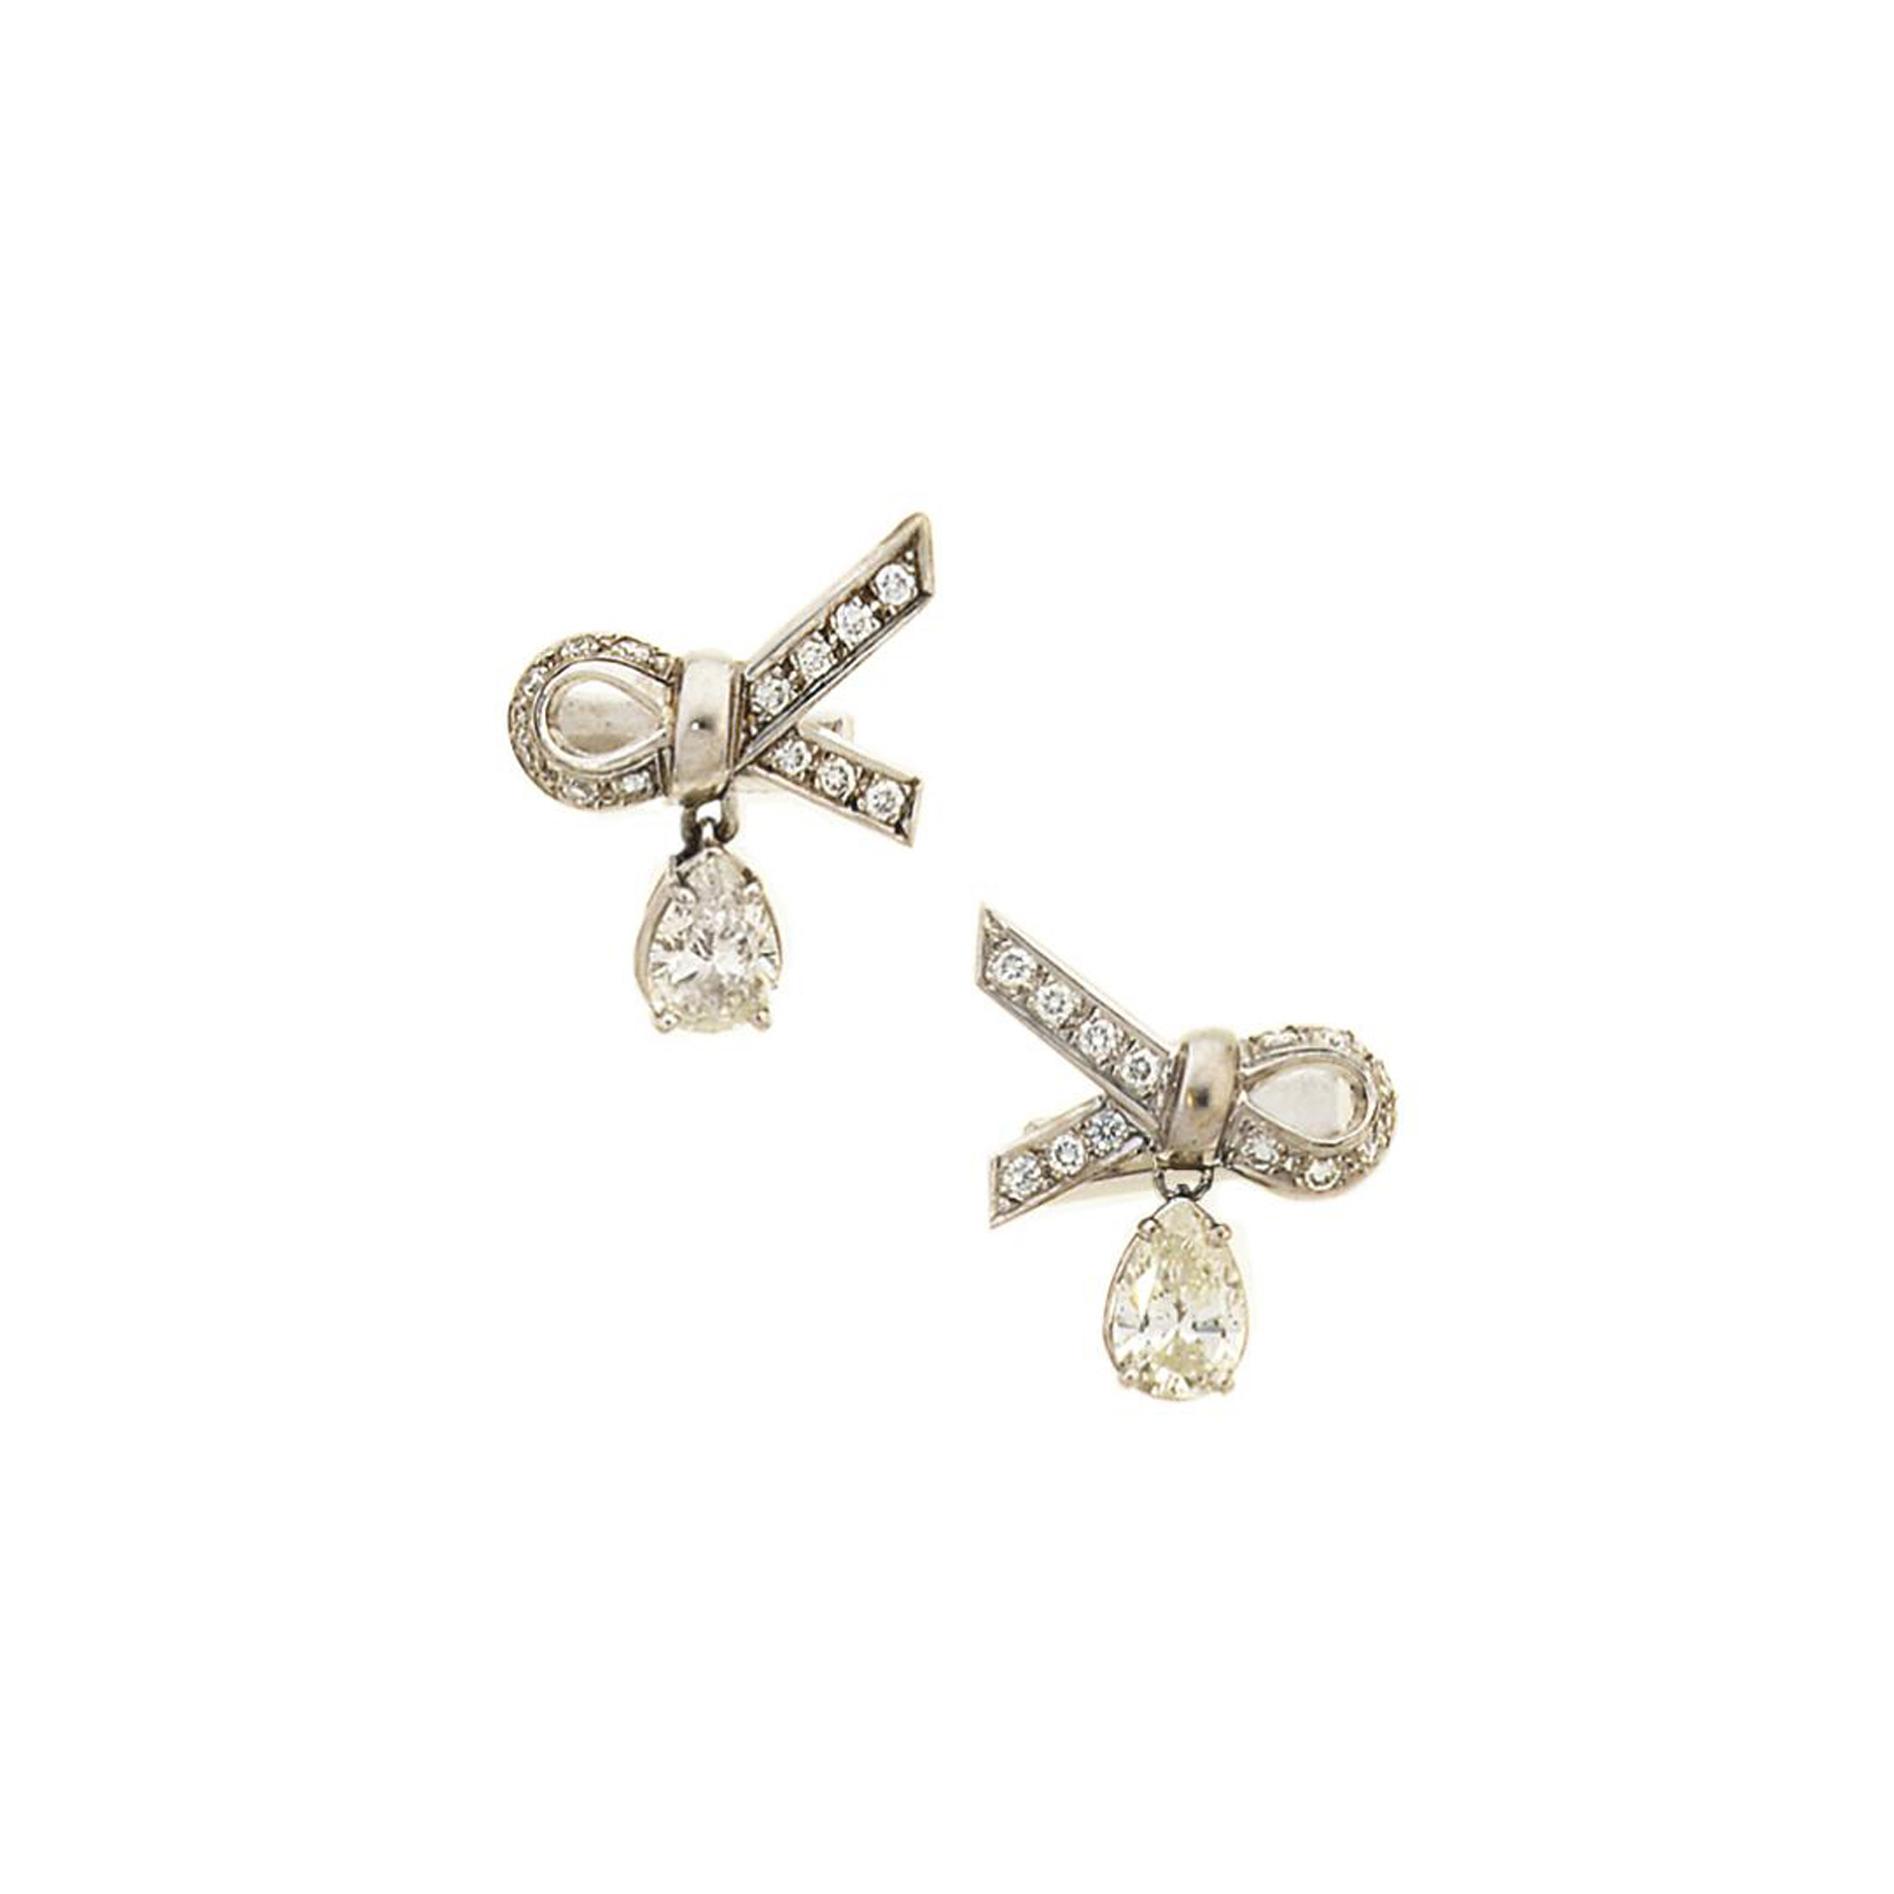 A pair of diamond cufflinks